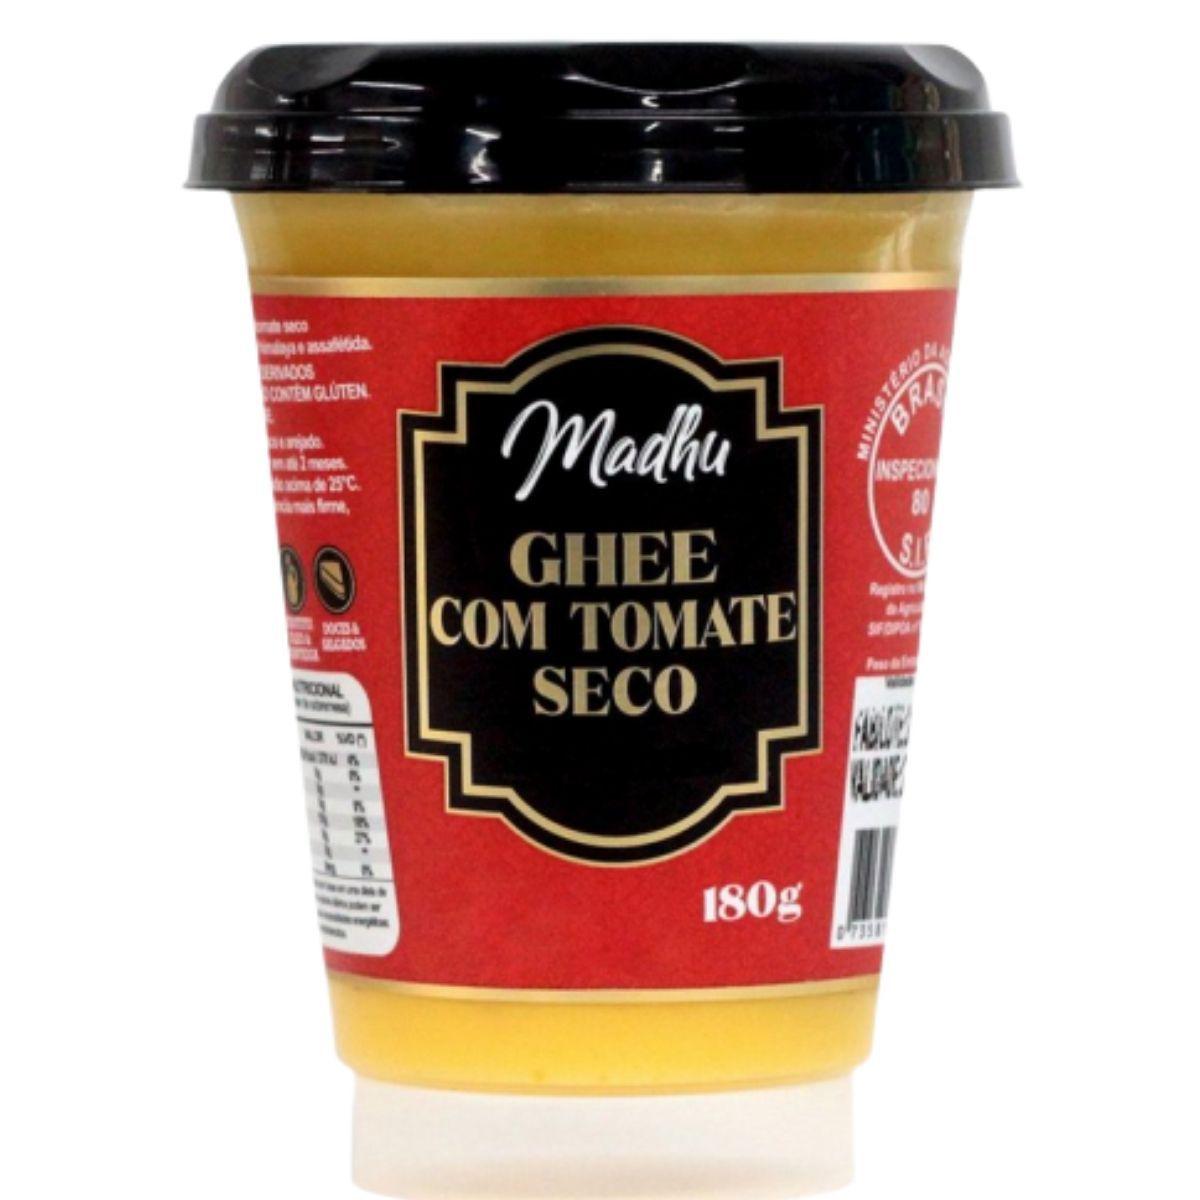 Manteiga Ghee C/ Tomate Seco Clarificada 180g - Madhu Bakery